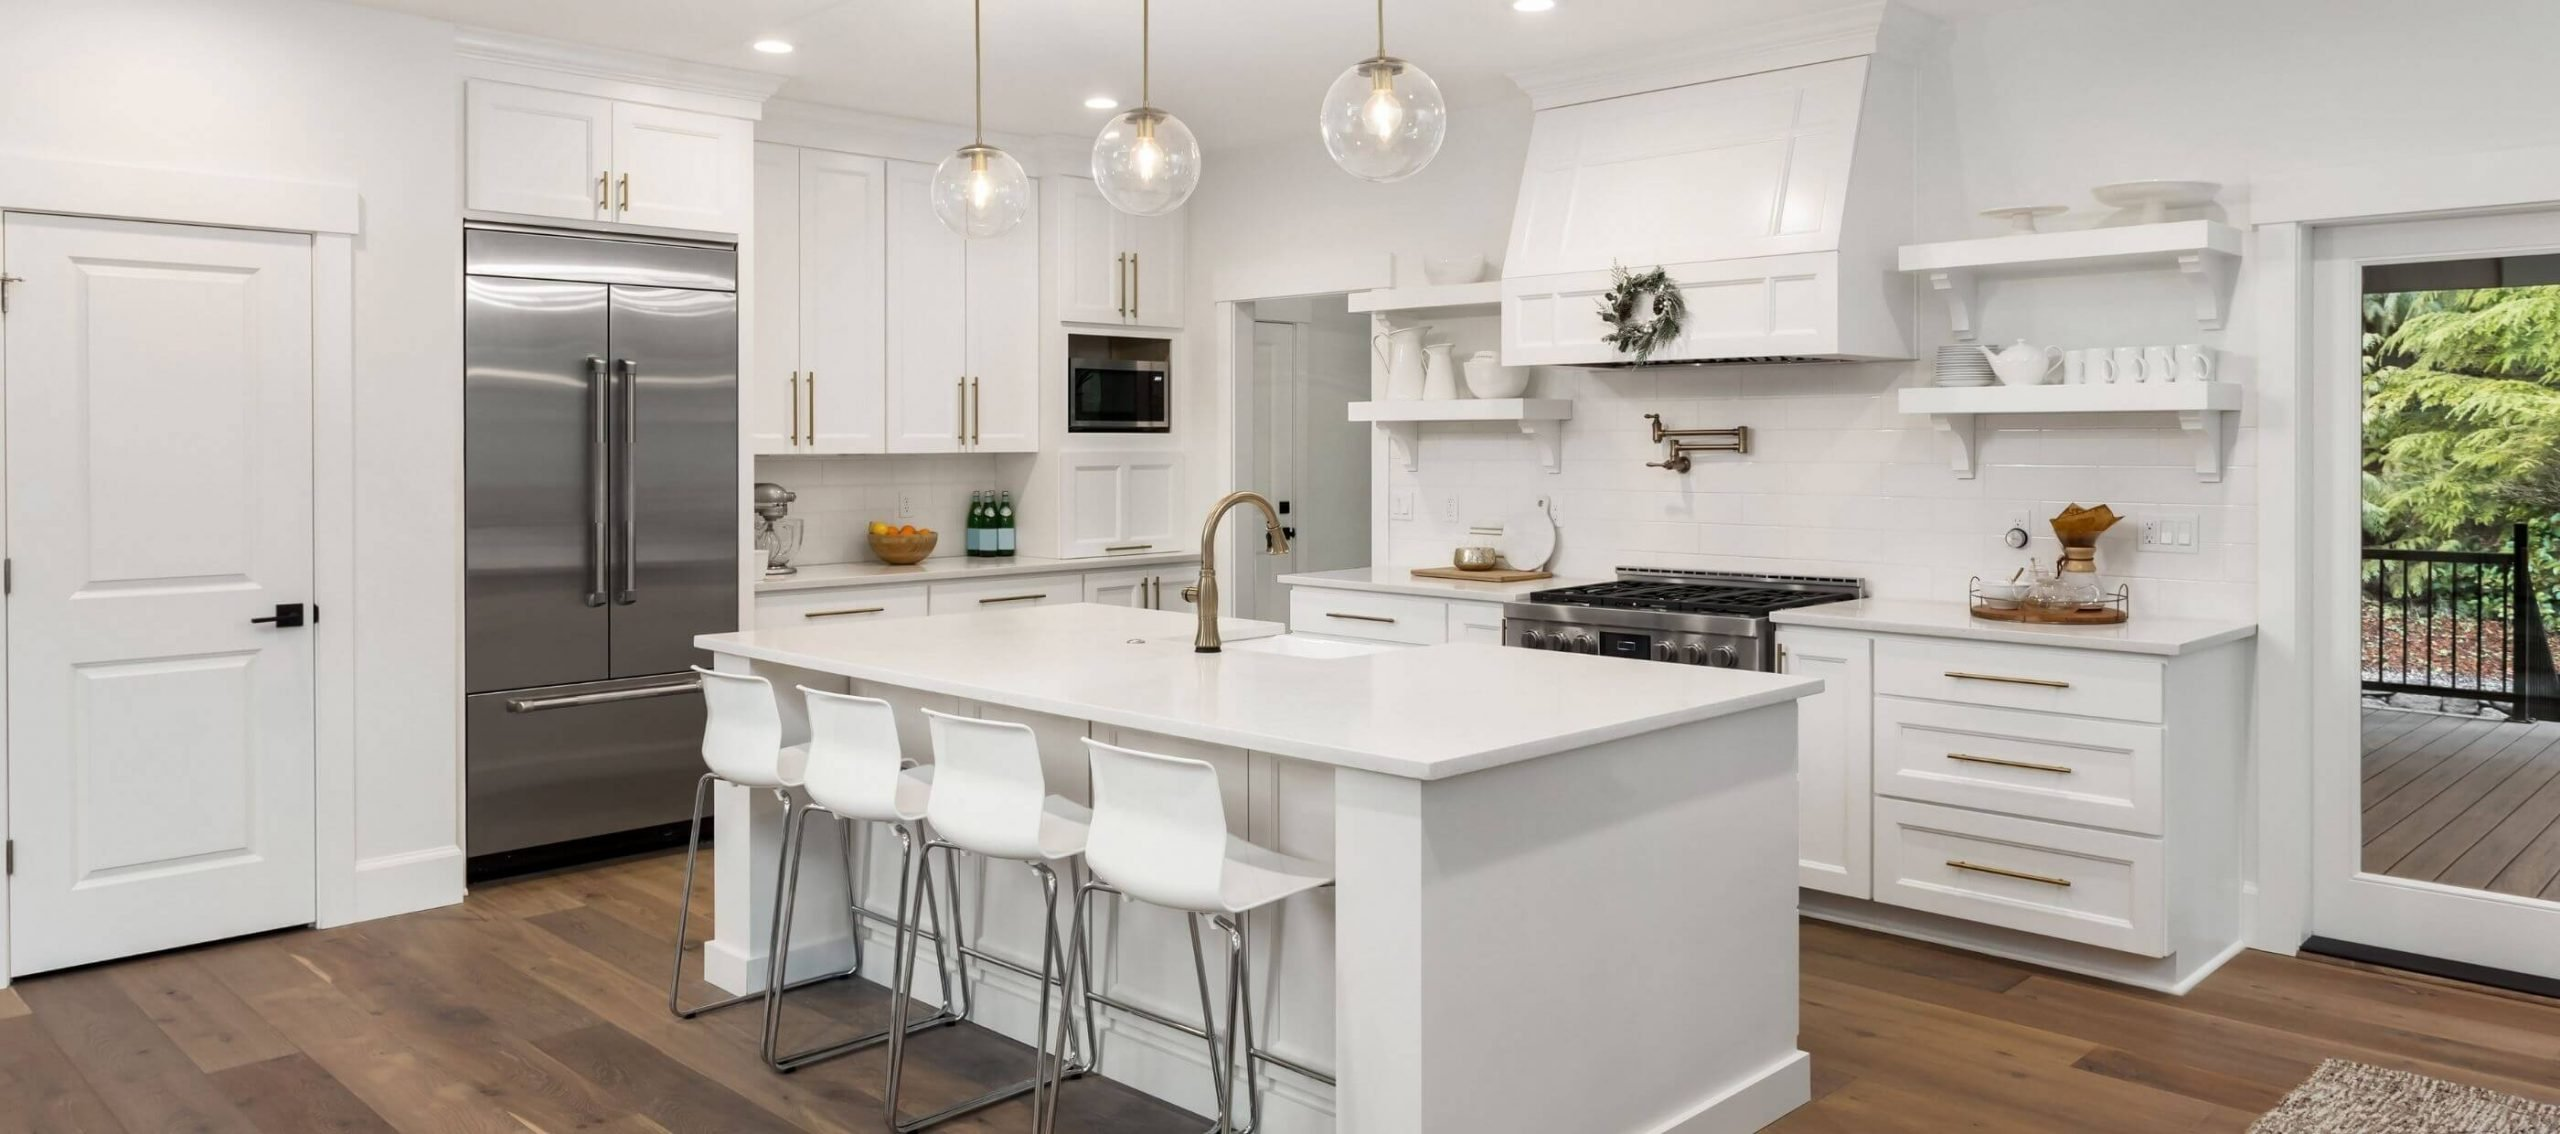 Kitchen Remodeling Modular Remodeling And Design